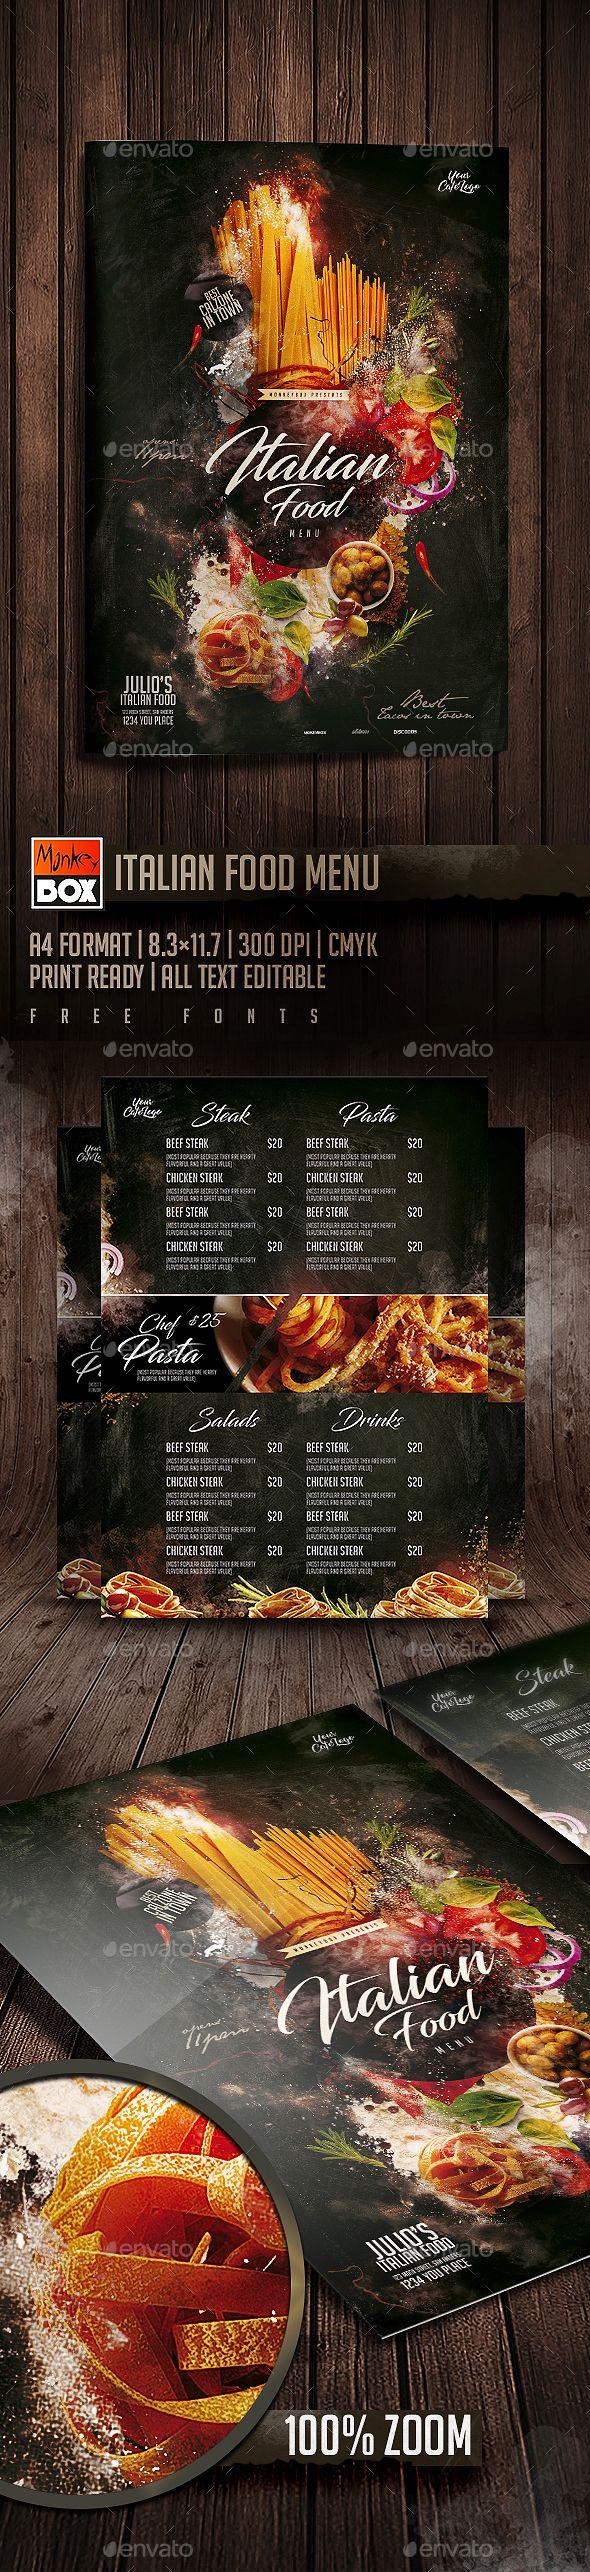 Italian Food Menu — Photoshop PSD #caffe #cover • Download ➝ https://graphicriver.net/item/italian-food-menu/19703094?ref=pxcr